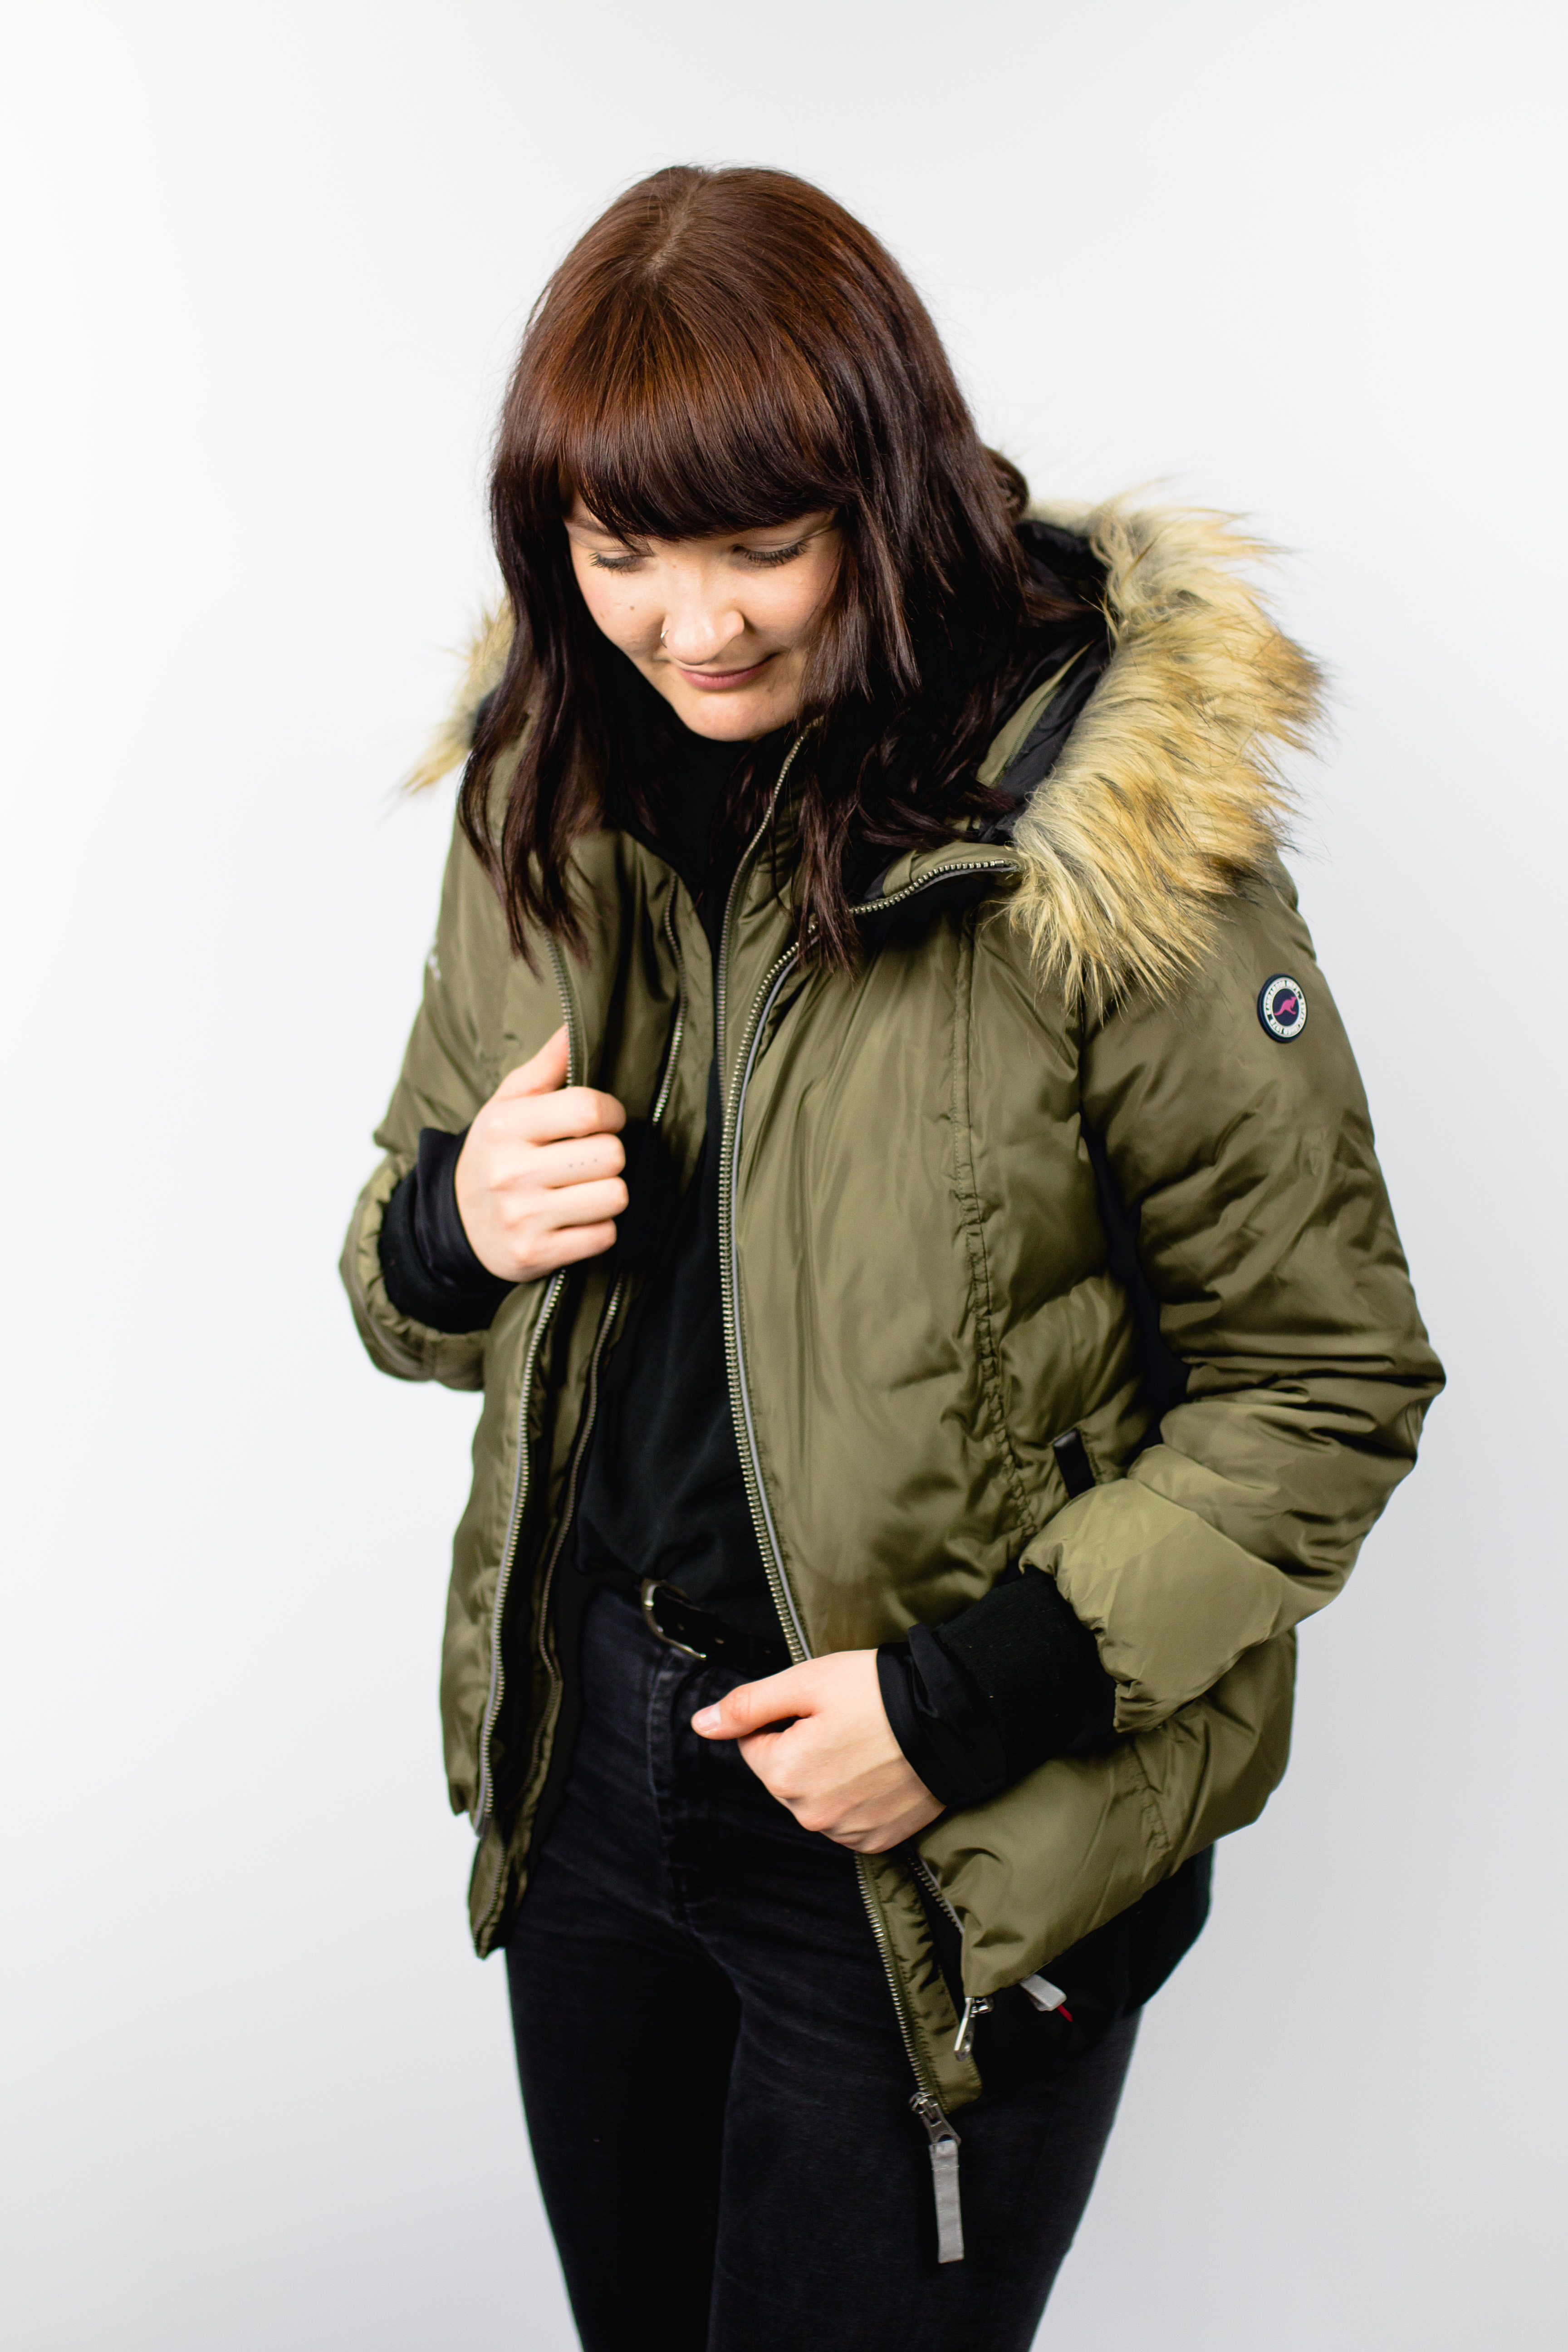 KangaROOS Damen Daunenjacke Daunen Jacke mit Kunstfell Kragen und Kapuze